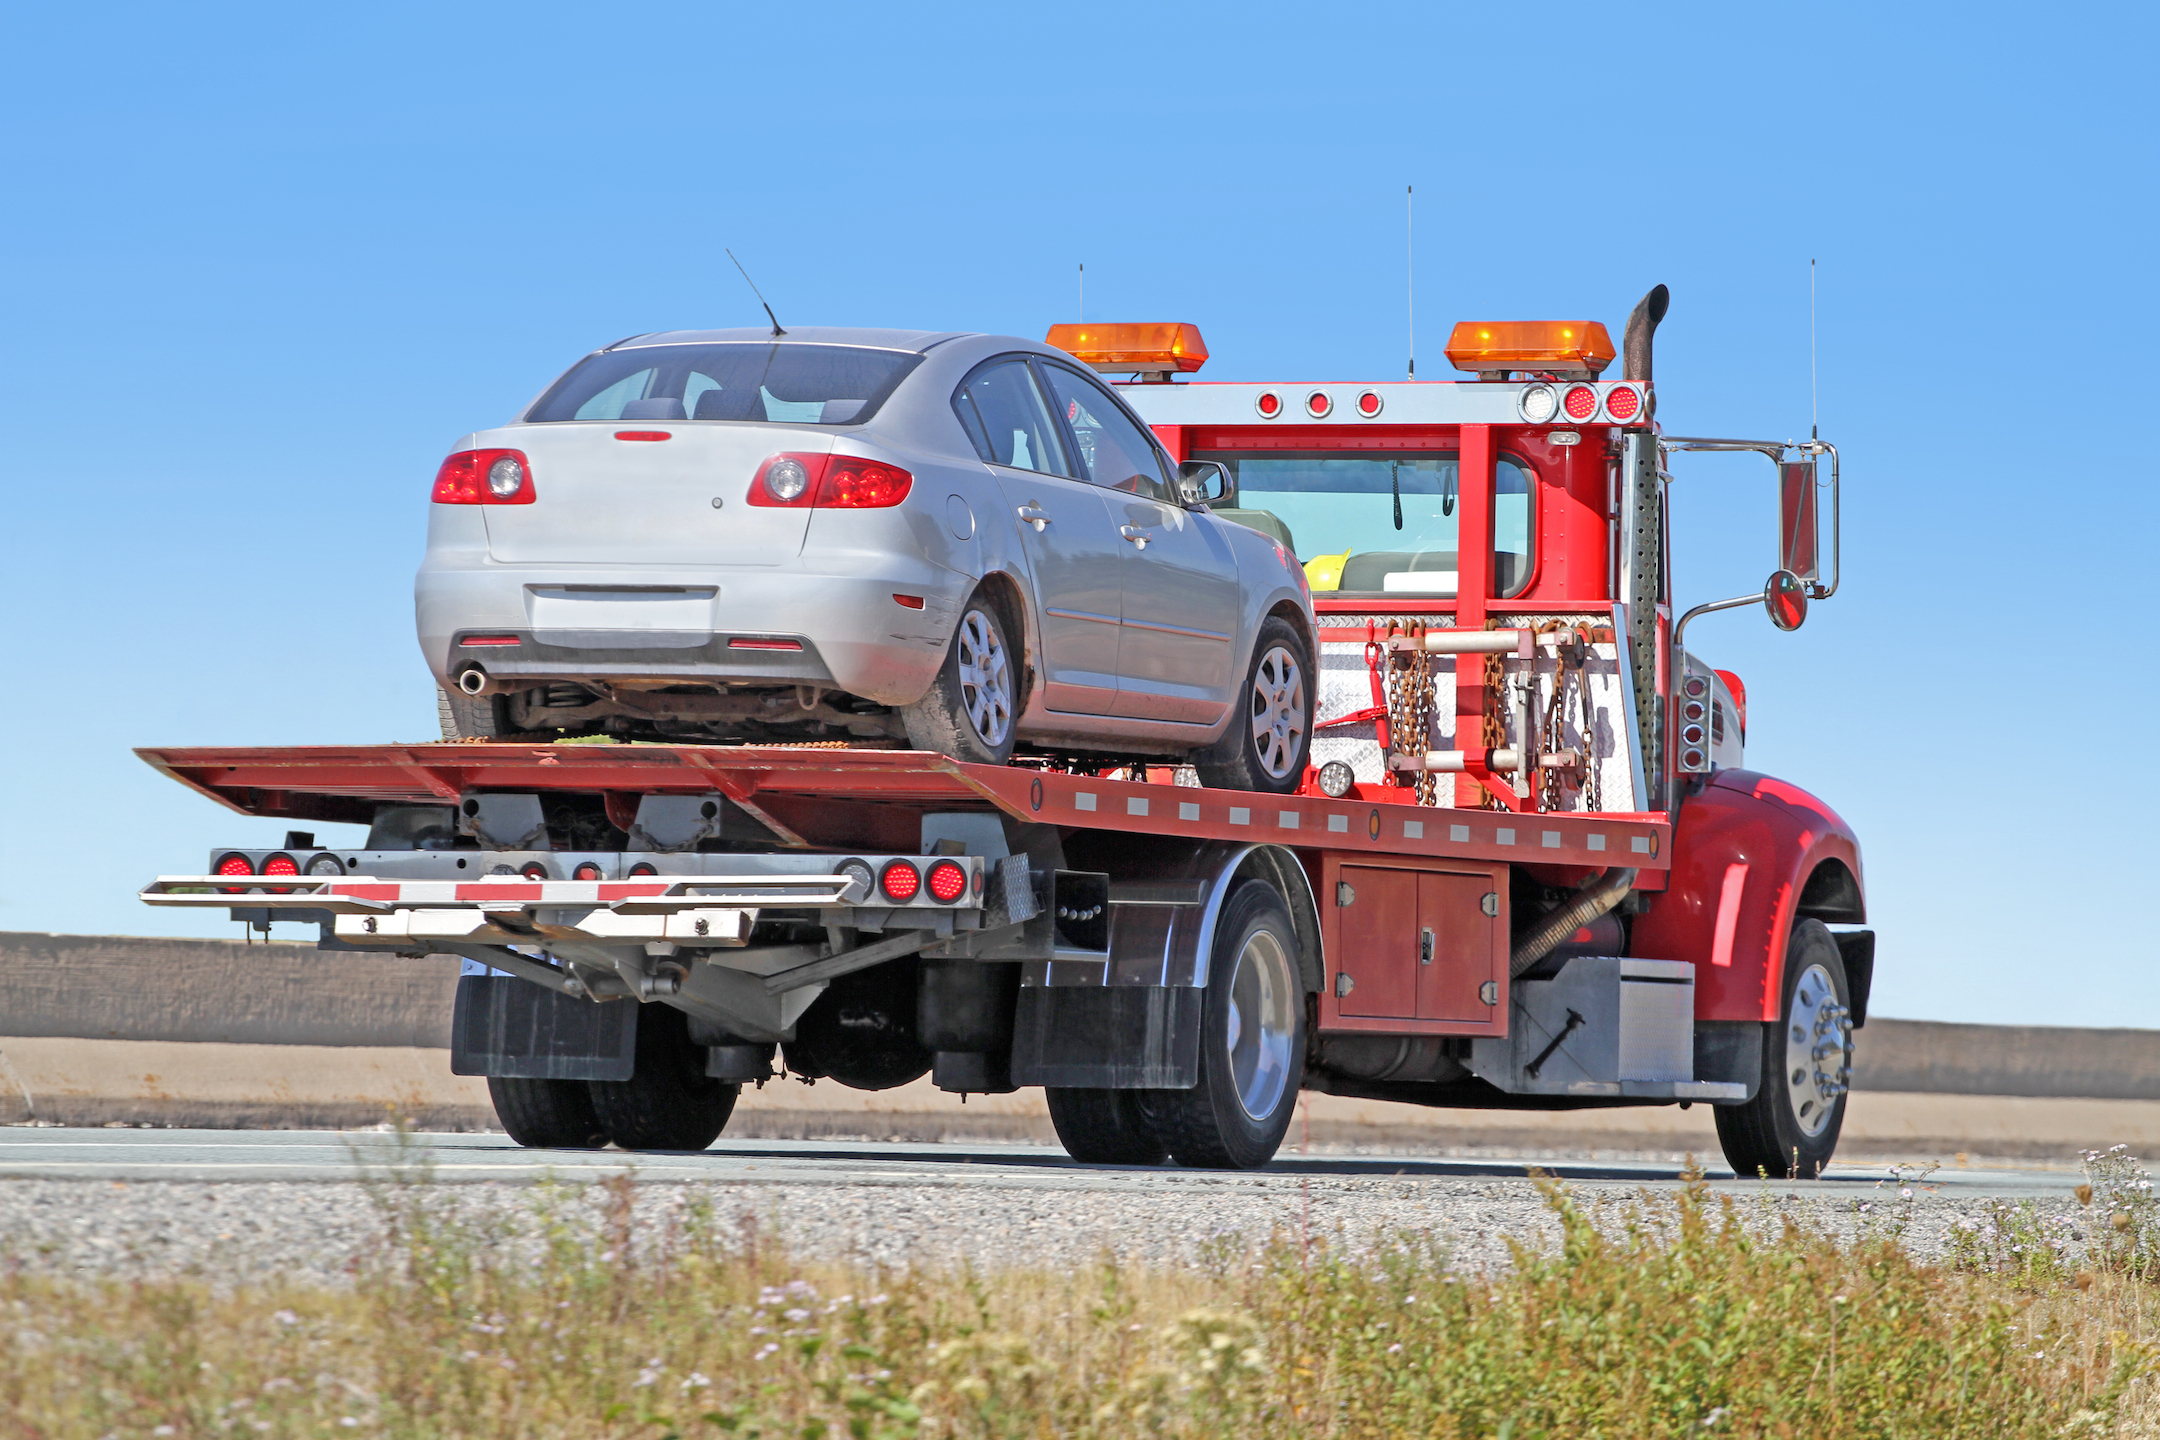 Vehicle Towing Company image 3